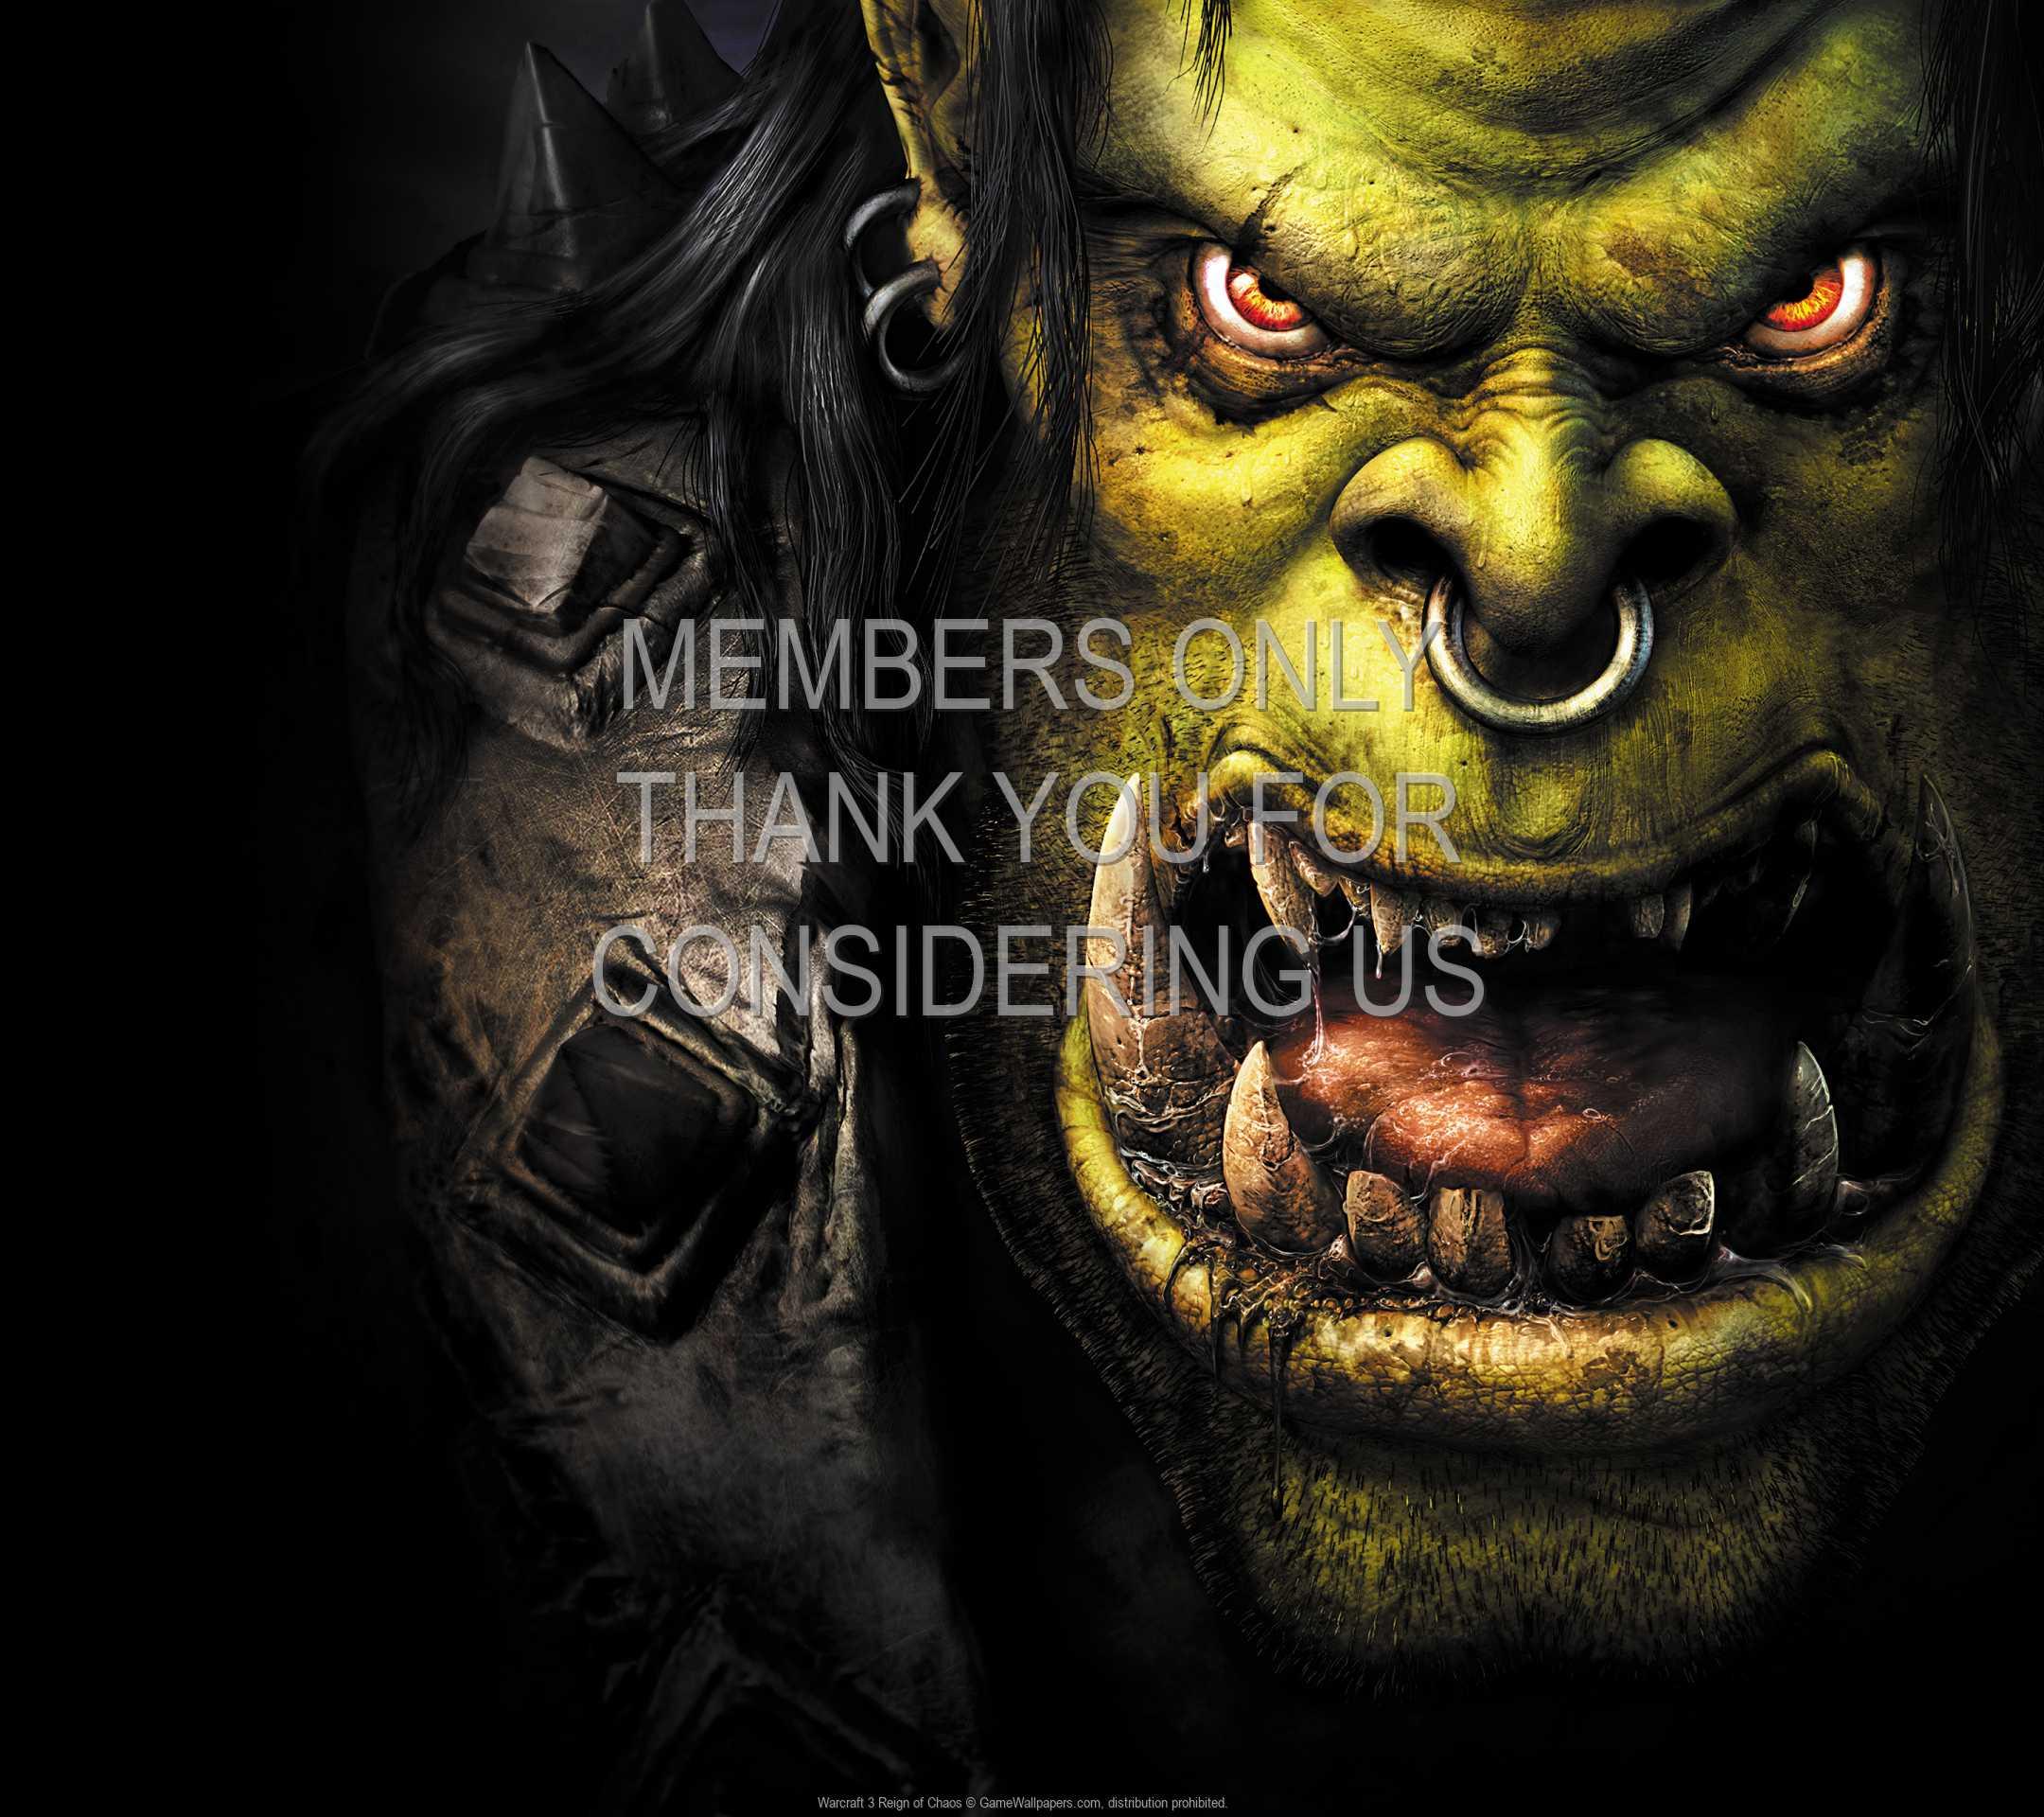 Warcraft 3: Reign of Chaos 1080p Horizontal Handy Hintergrundbild 25